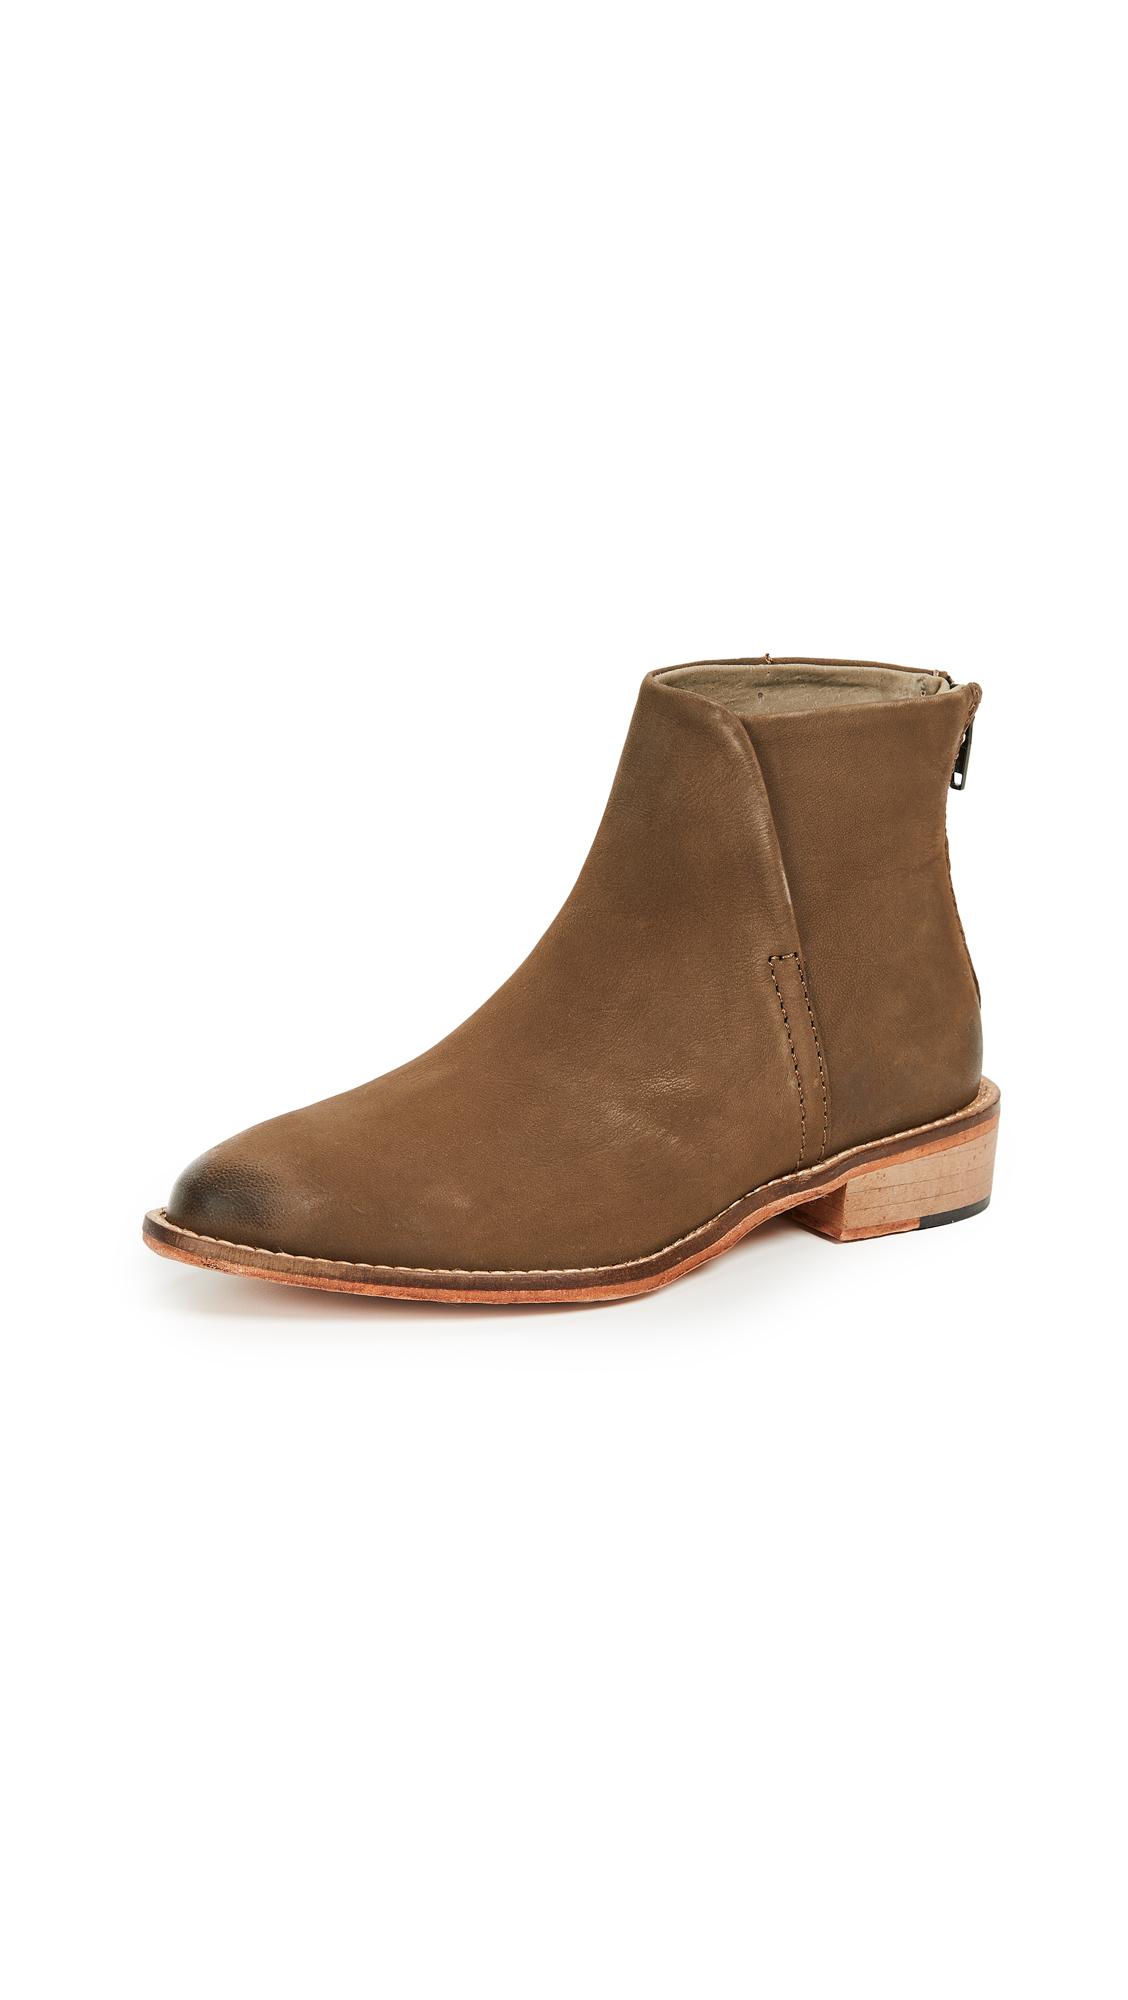 Free People Century Flat Boots - Khaki